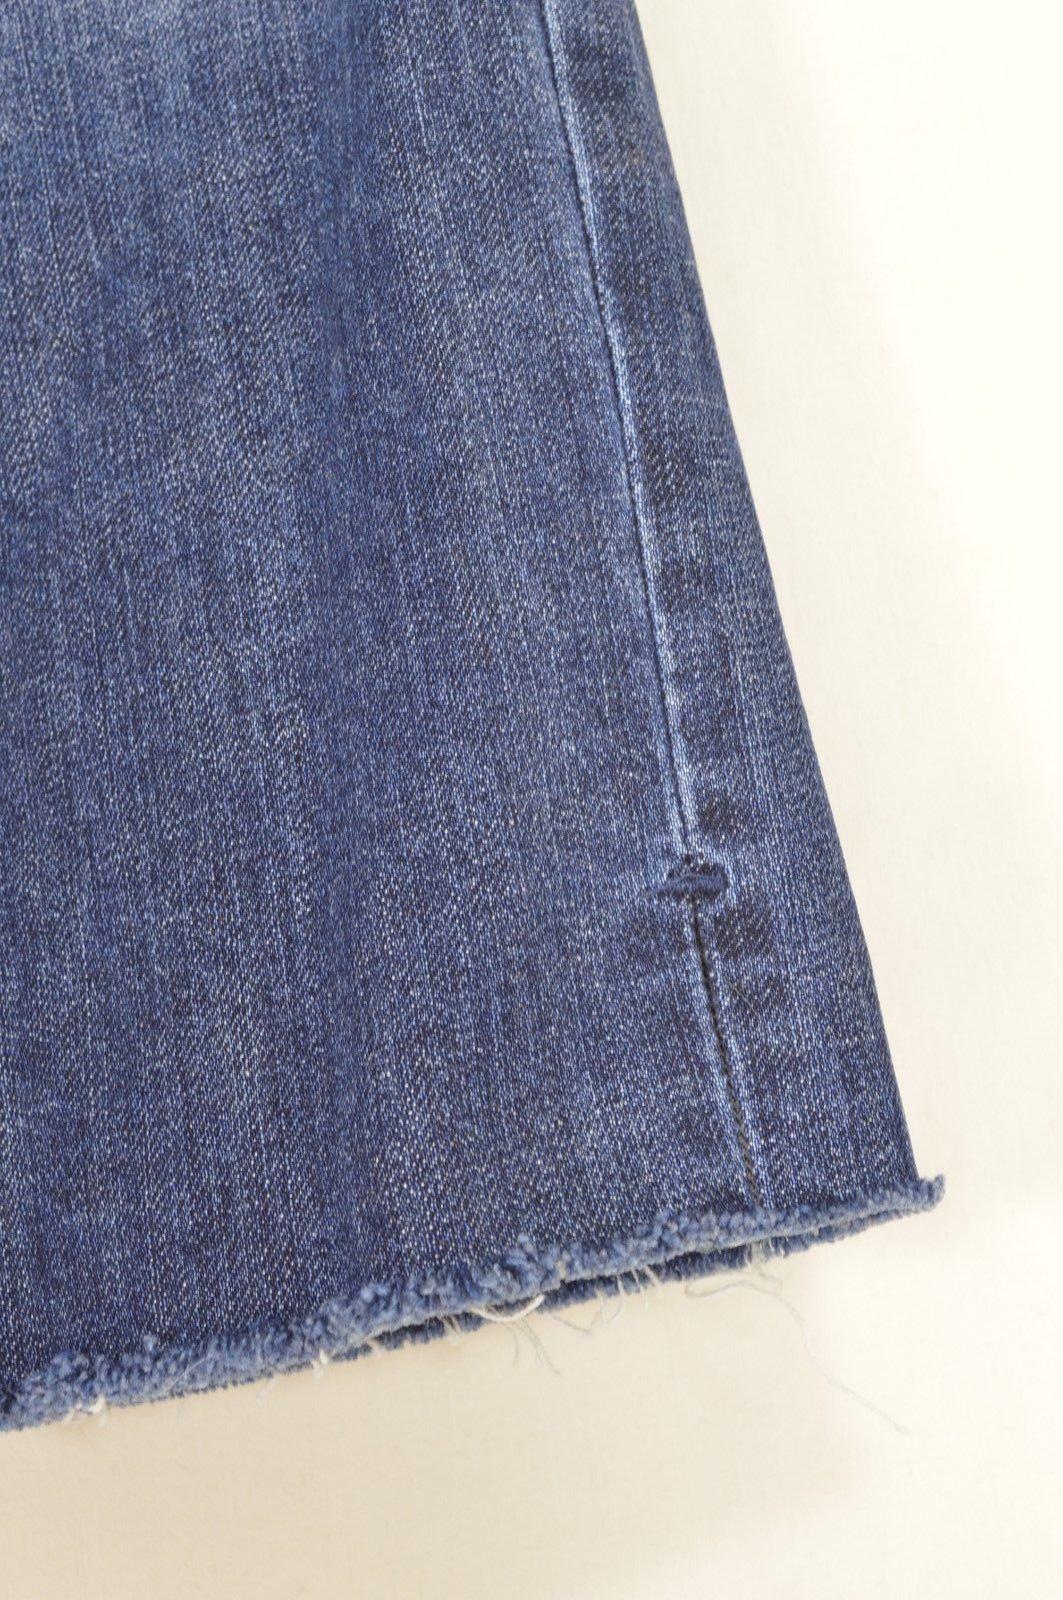 Joe's Jeans 29 Honey Kicker Klum wash roll ups cropped destroyed distressed